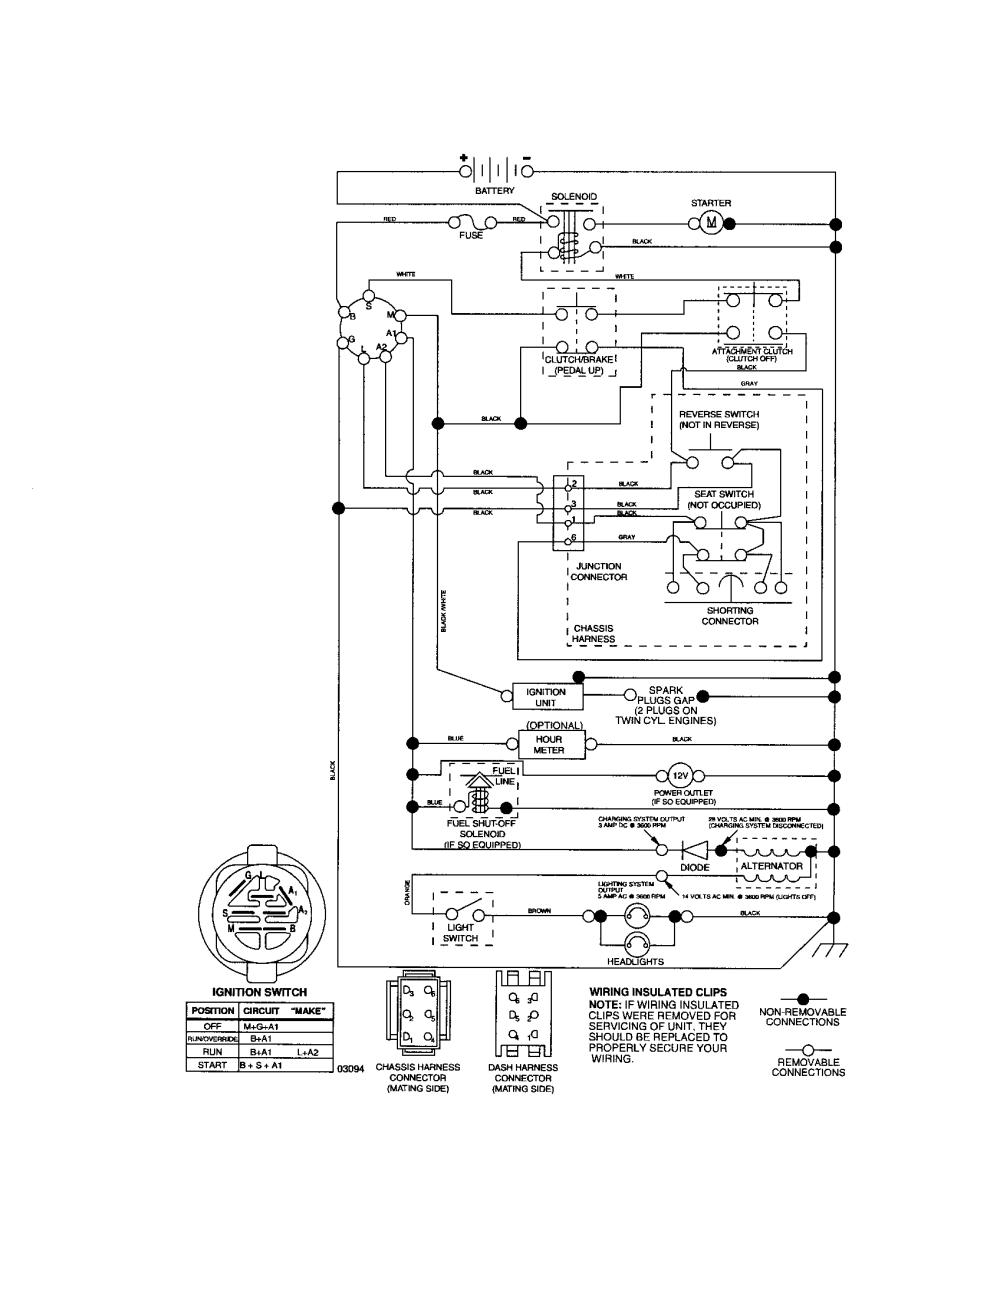 medium resolution of craftsman 917287120 schematic diagram tractor diagram